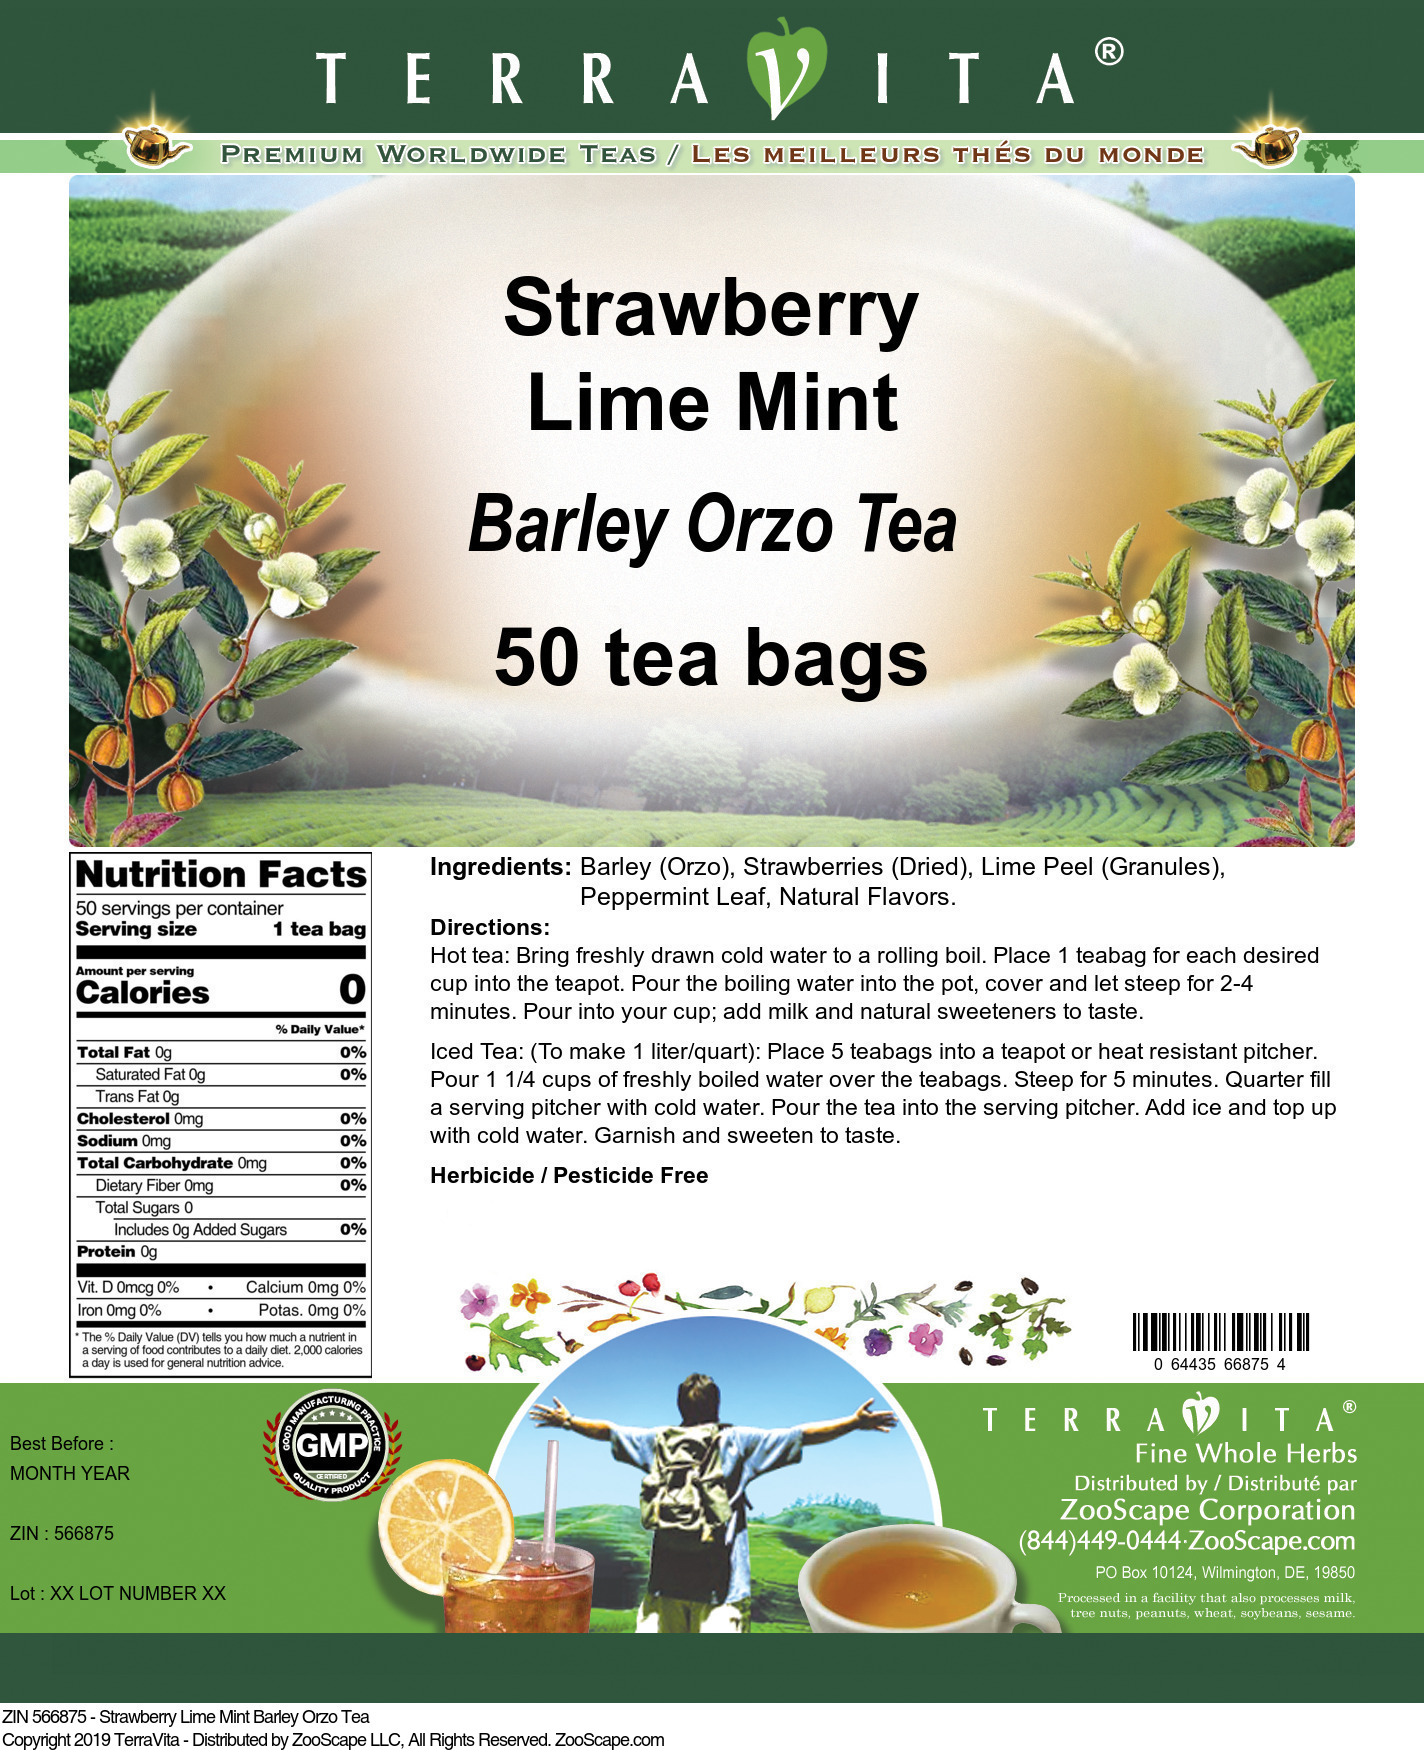 Strawberry Lime Mint Barley Orzo Tea